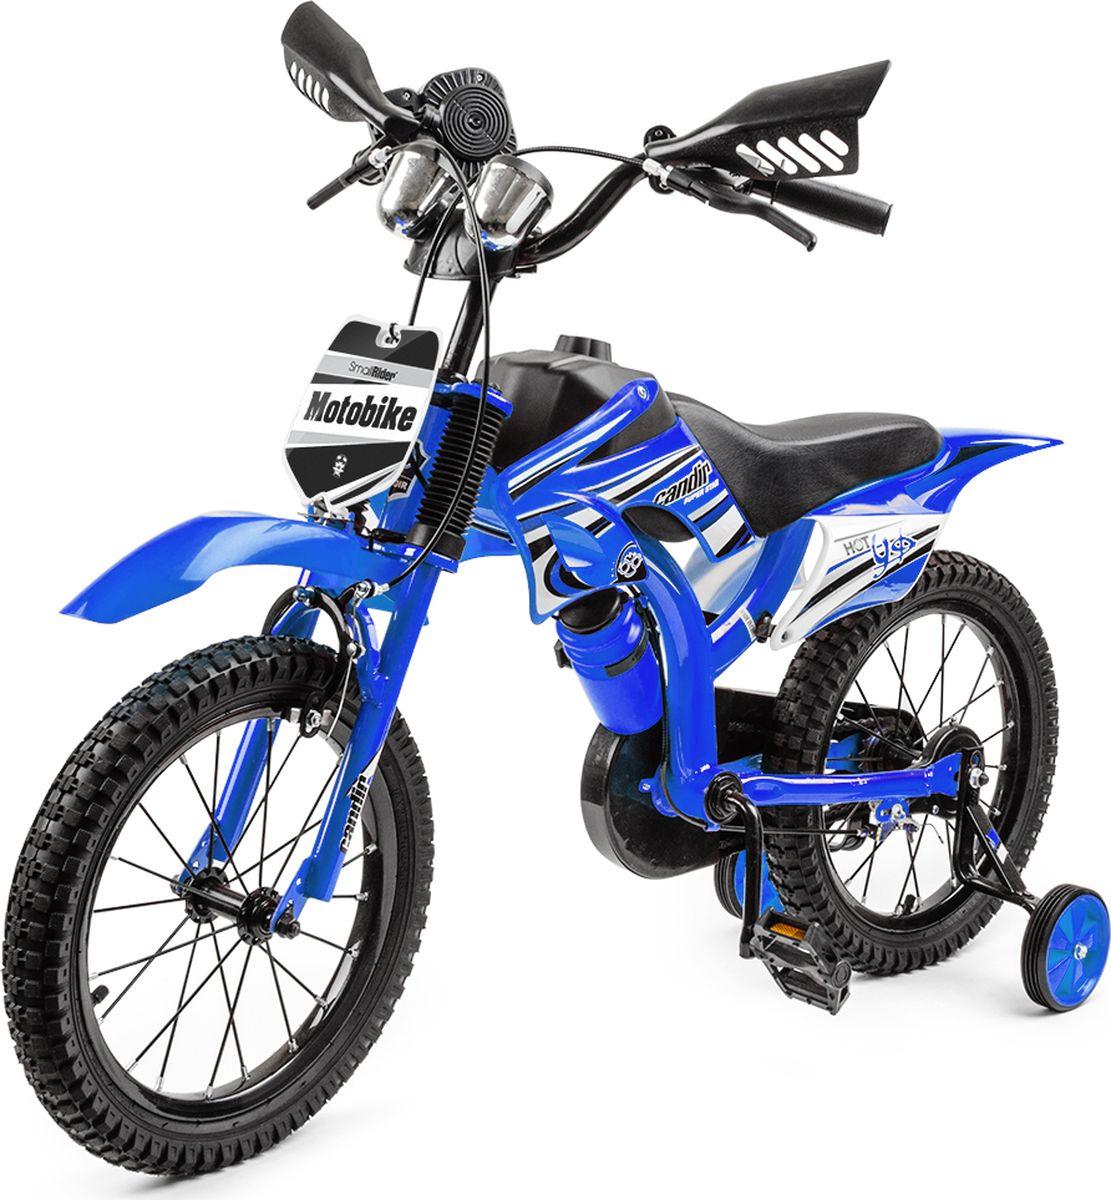 Small Rider Велосипед-мотоцикл детский Motobike Sport цвет